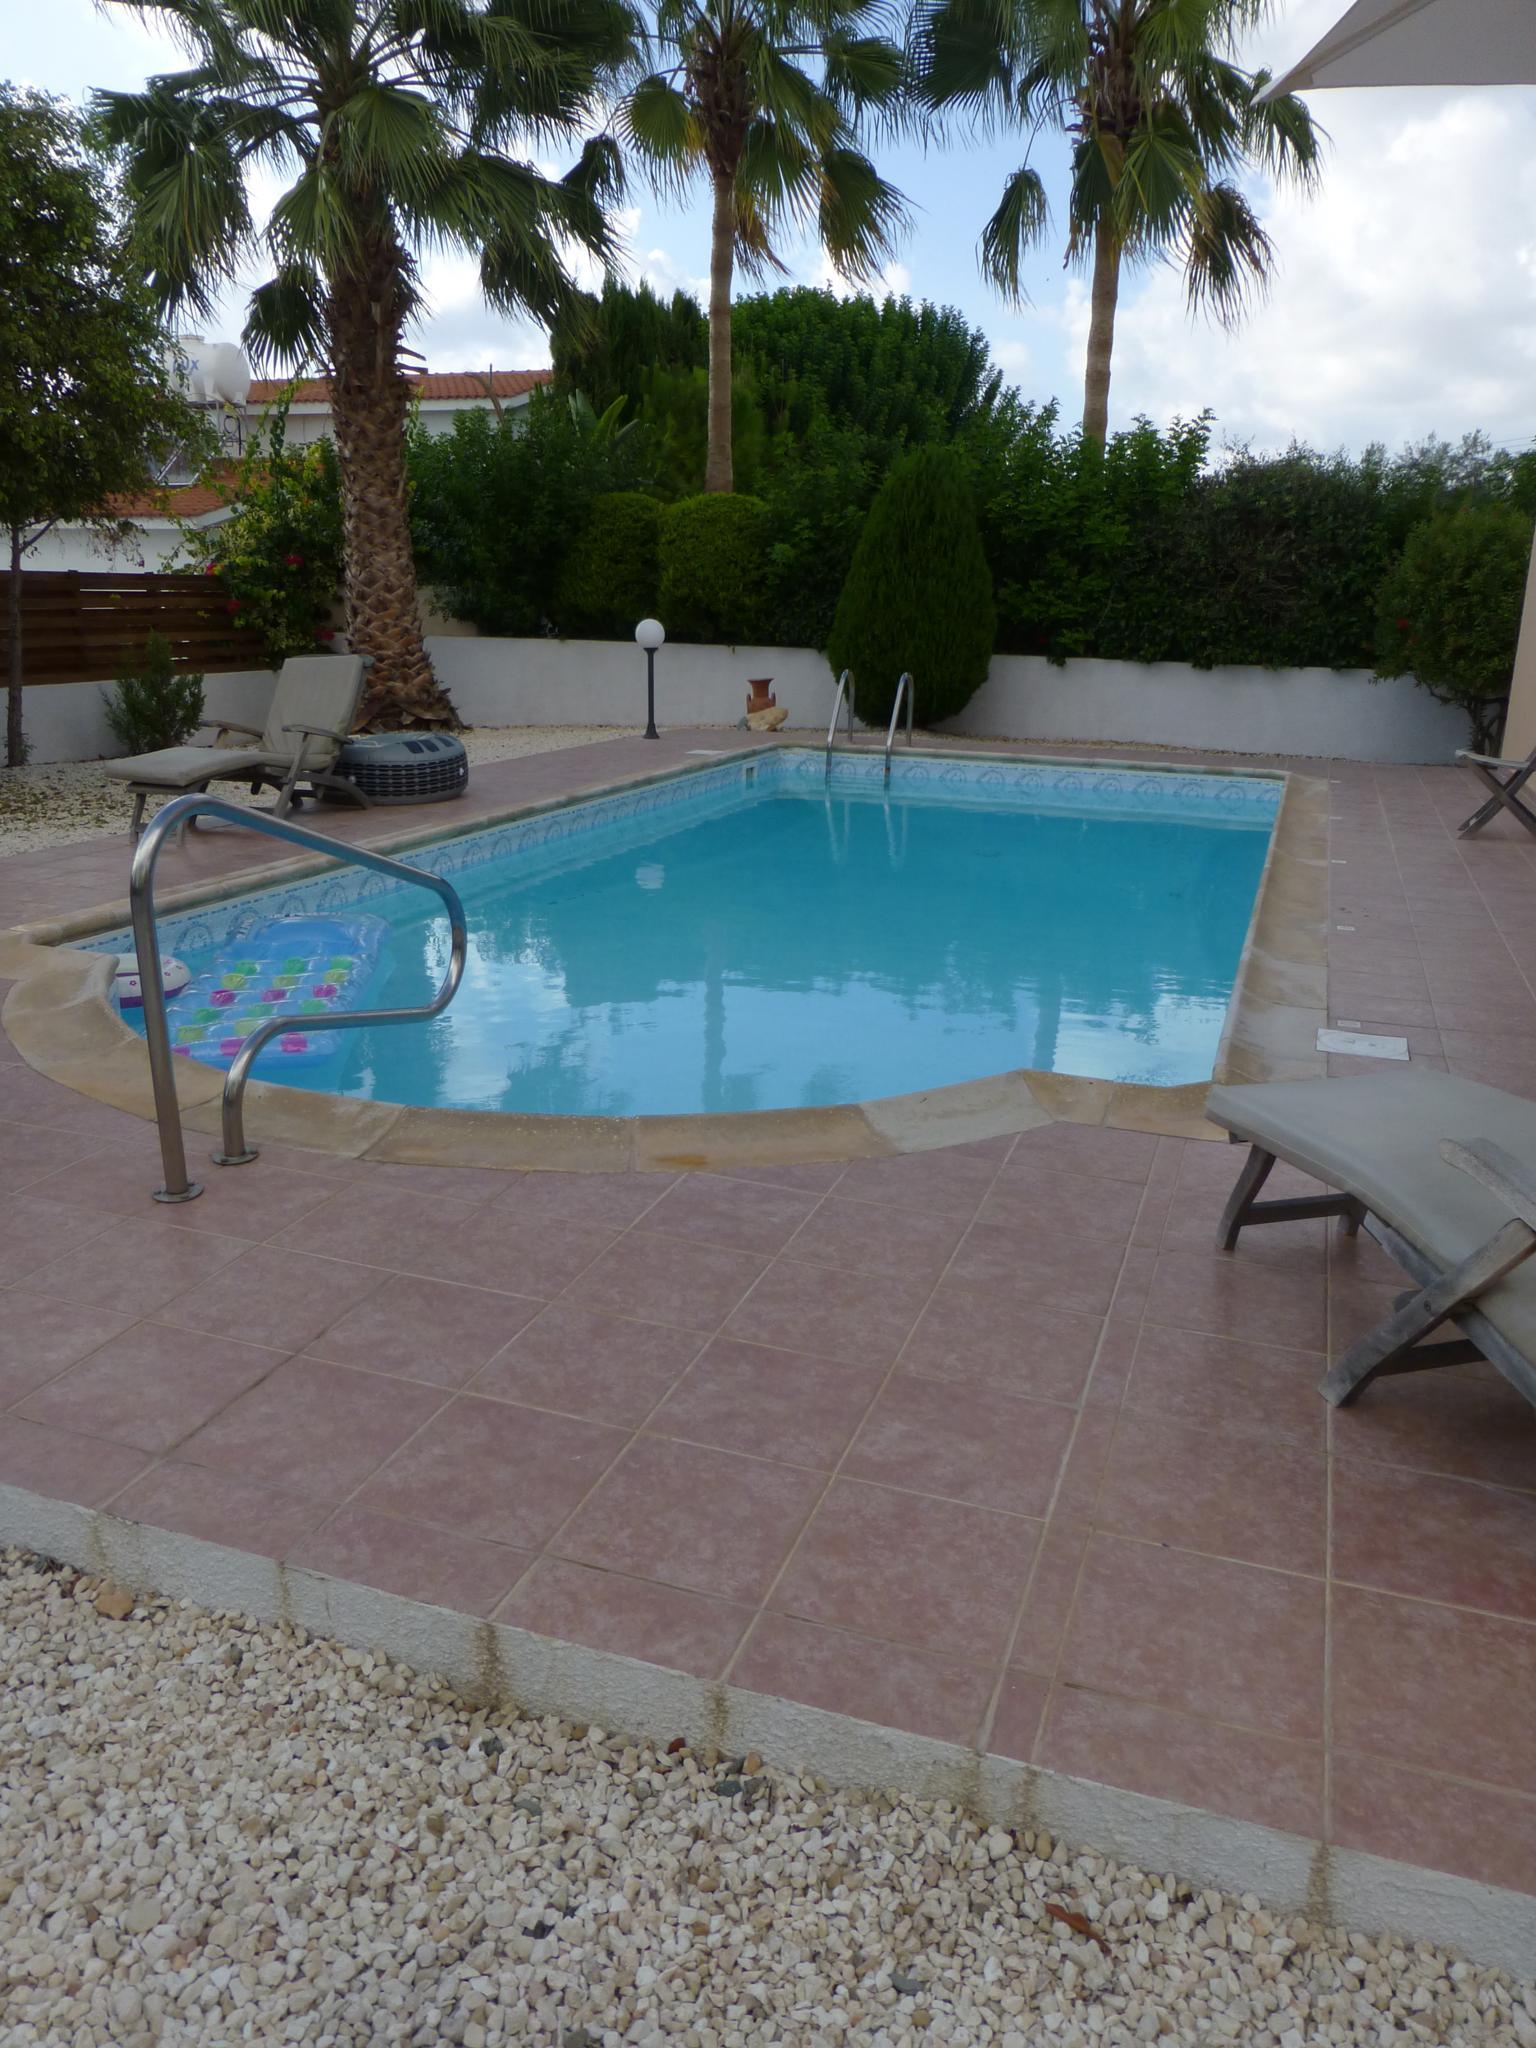 Swimming pool in Cyprus by laurahebbes